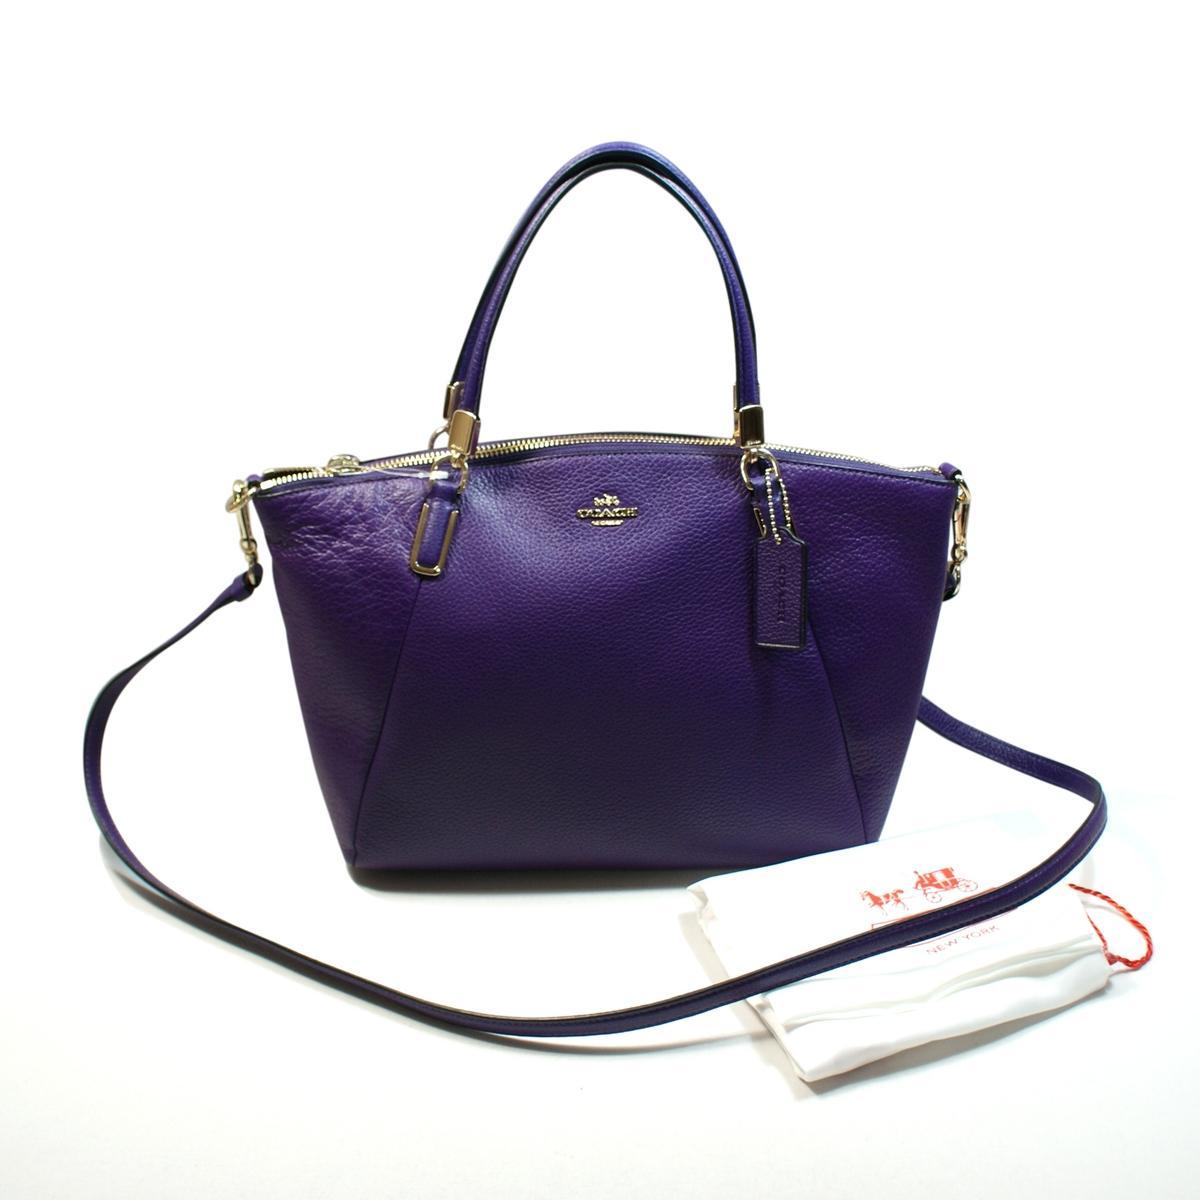 Coach Pebbled Leather Small Kelsey Violet Handbag\/ Crossbody Bag #33733  Coach 33733